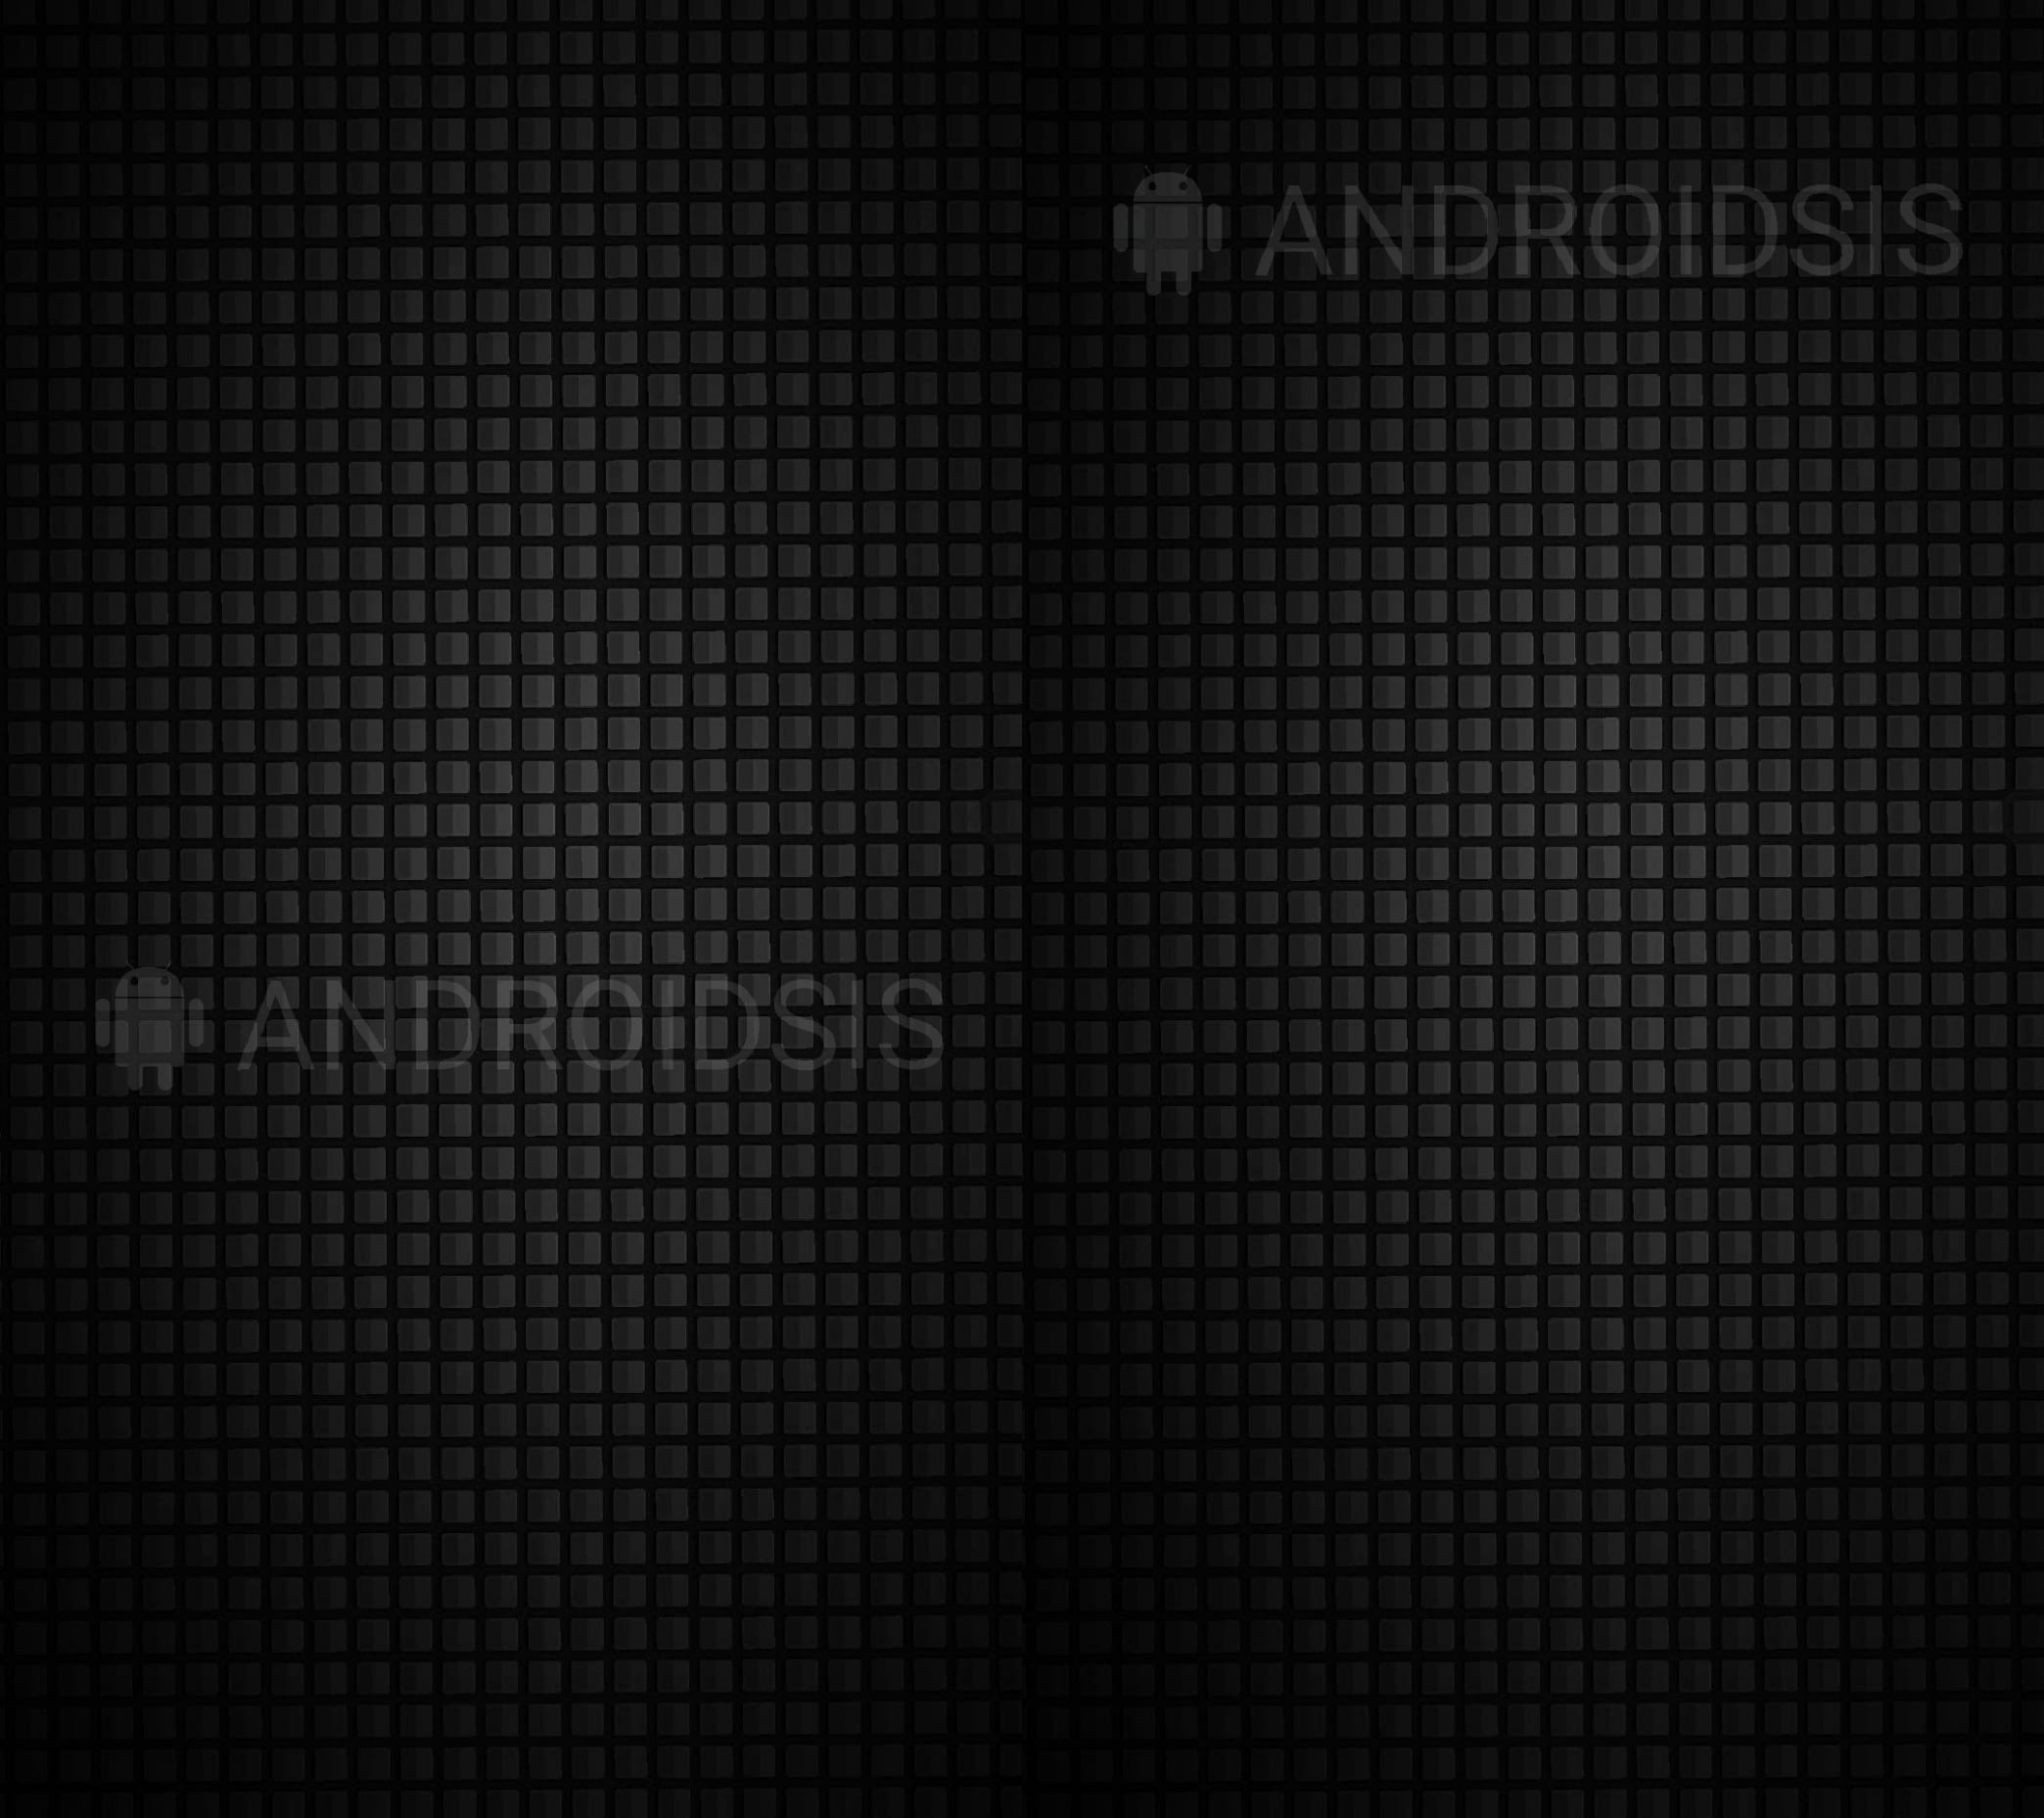 Descarga los Fondos de pantalla de Androidsis, son ¡¡GRATIS!!